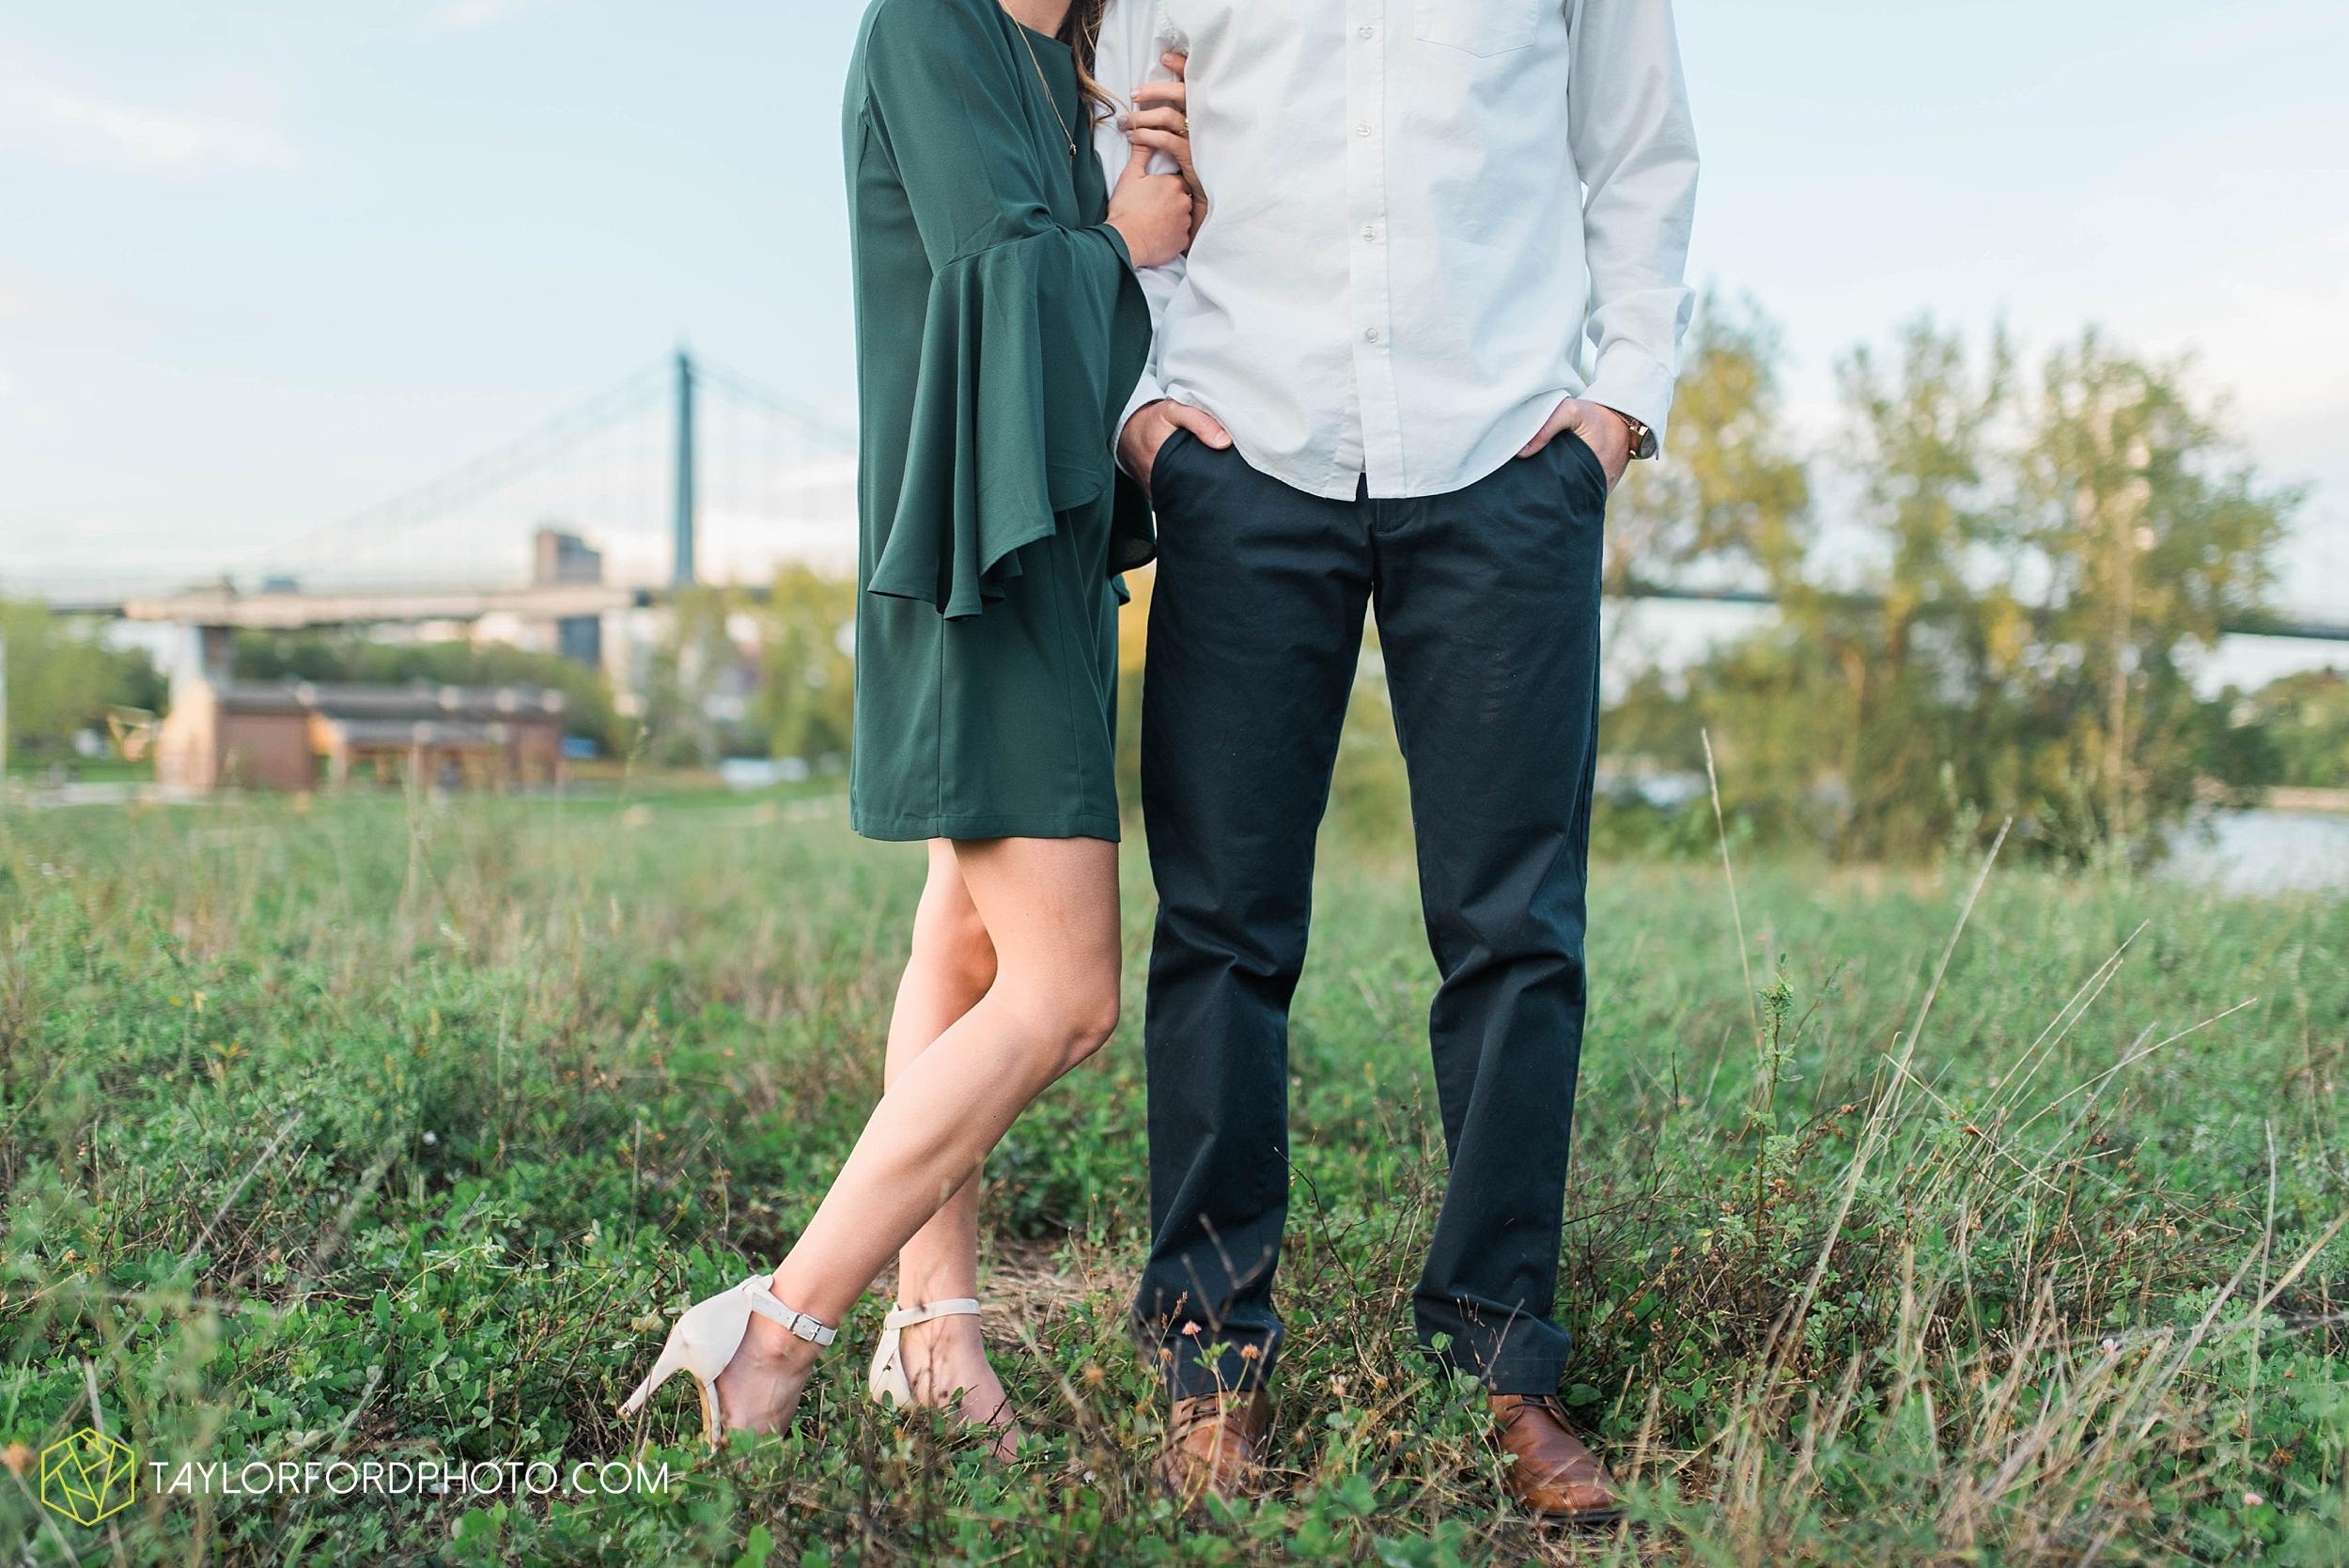 toledo-ohio-engagement-wedding-photographer-Taylor-Ford-Photography-oaks-openings-toledo-metro_3688.jpg